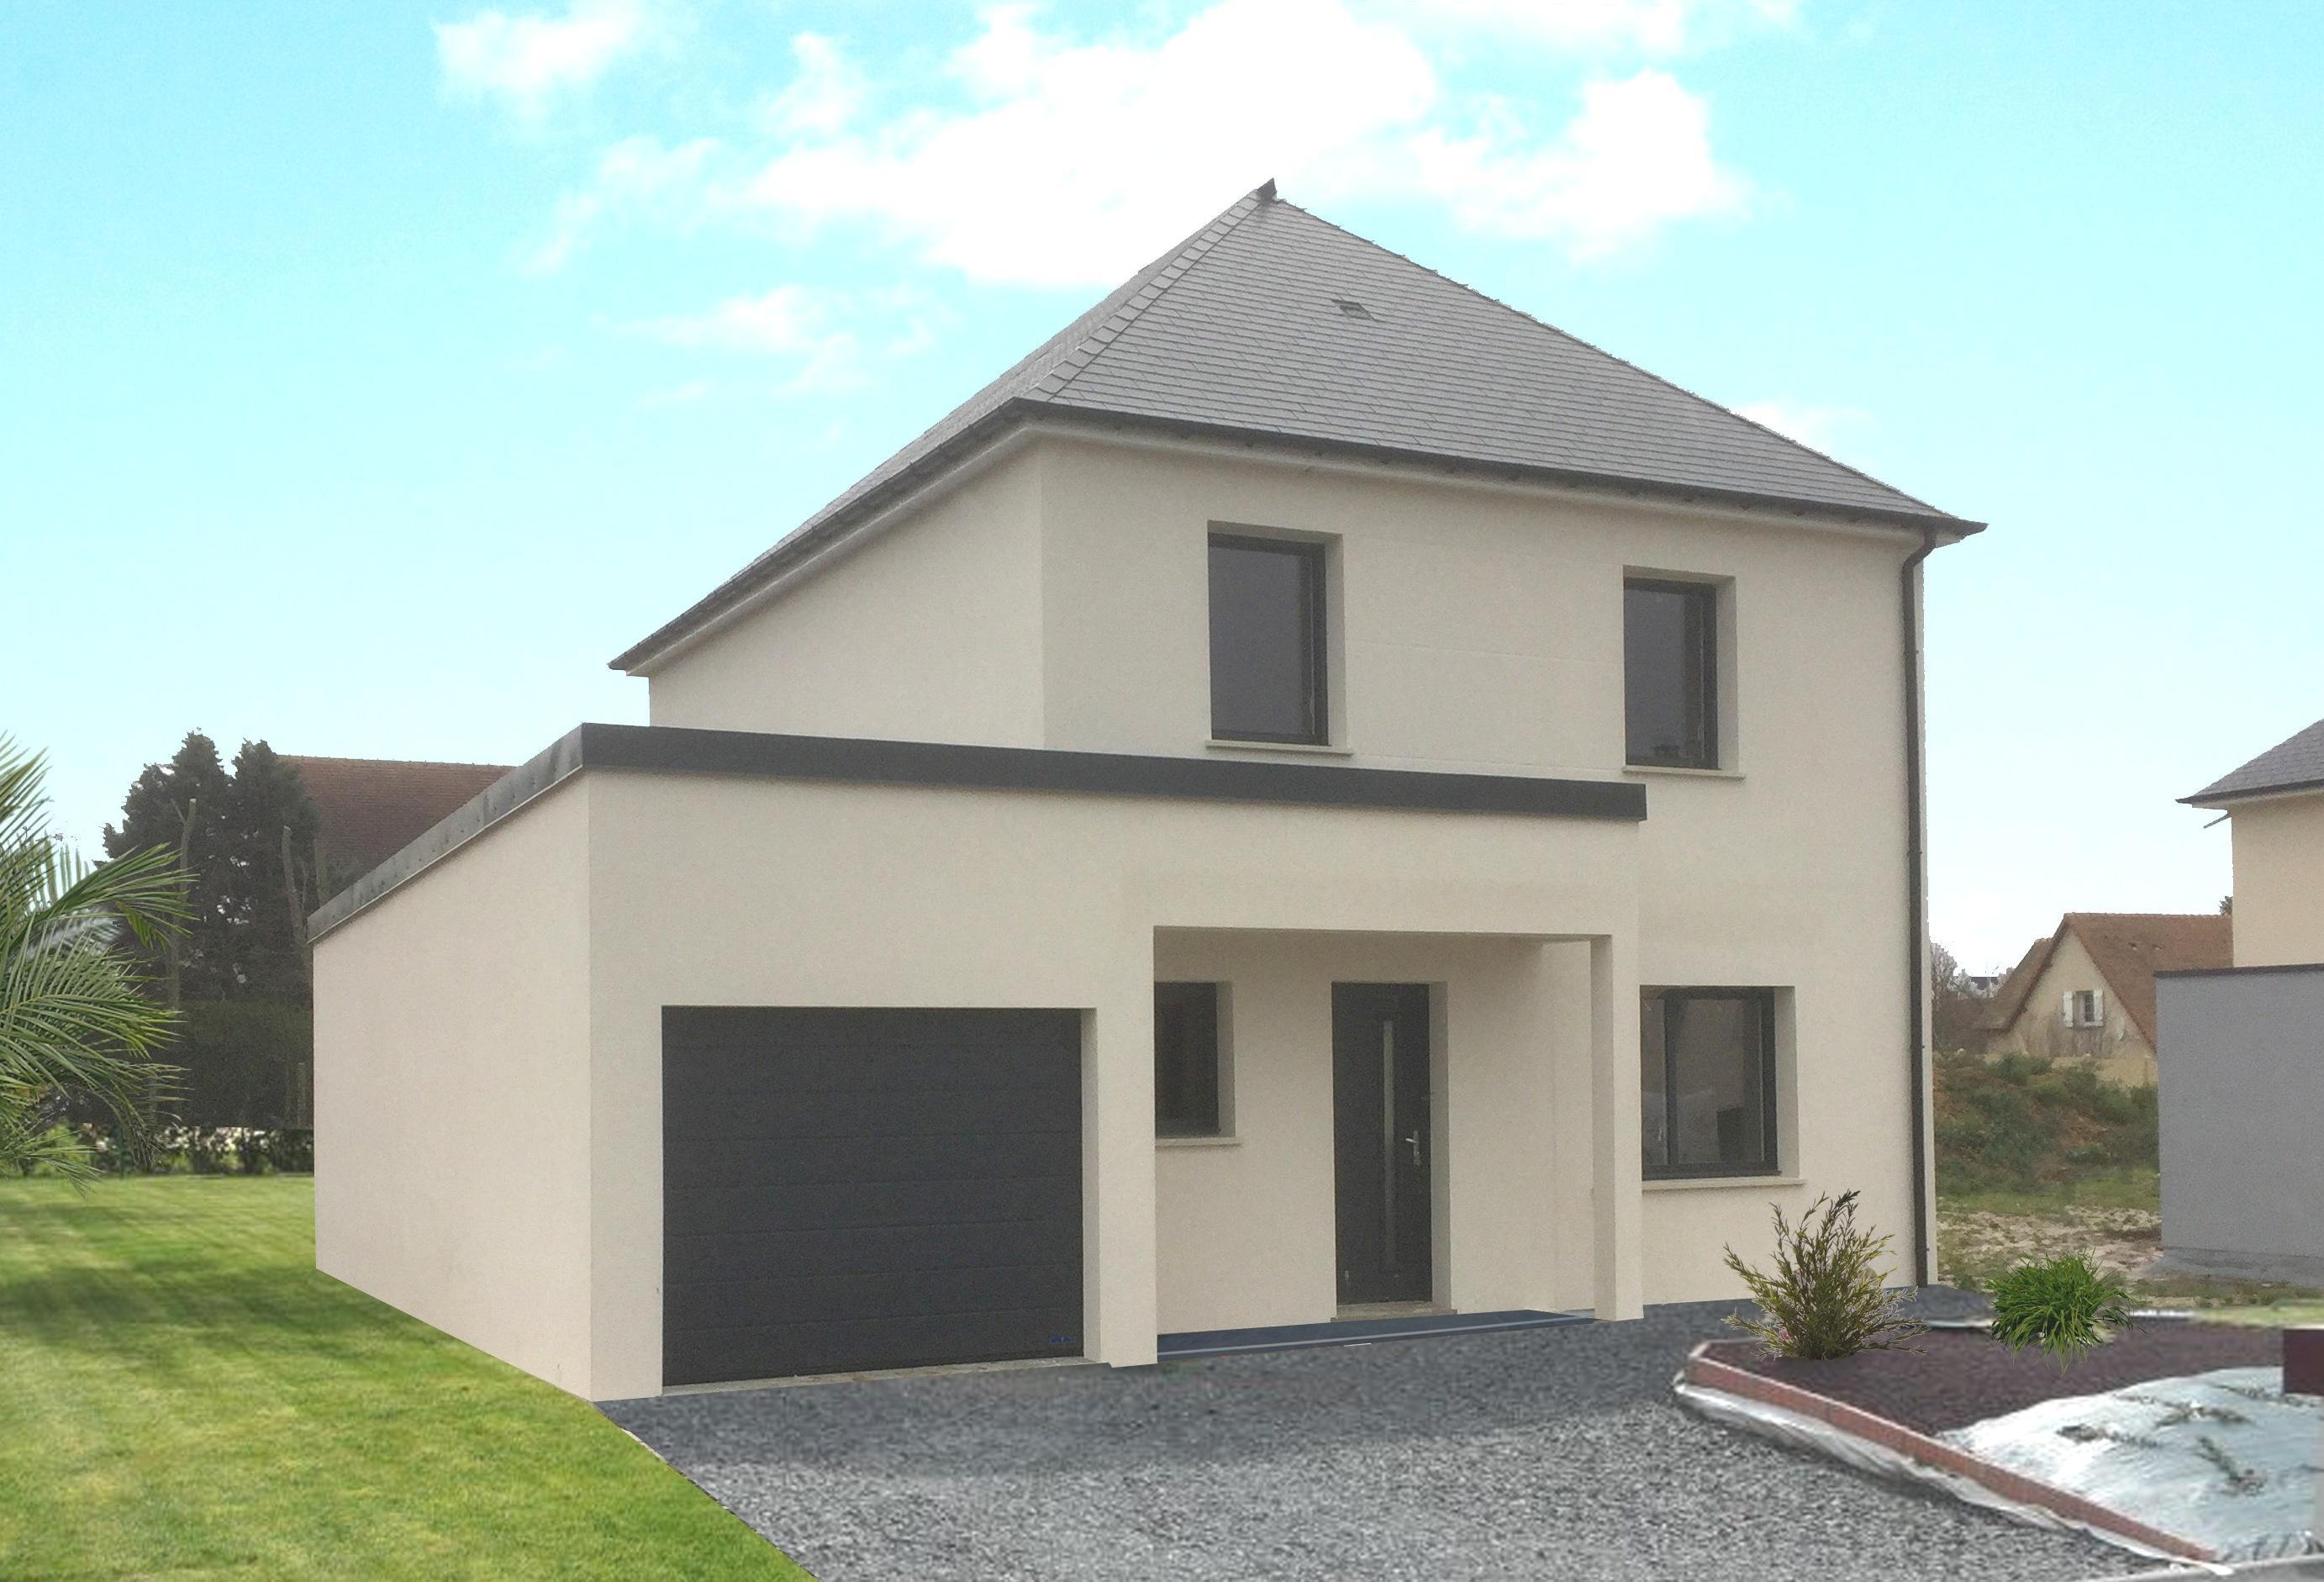 Maisons + Terrains du constructeur CASTOR MESNIL ESNARD • 103 m² • MONTMAIN